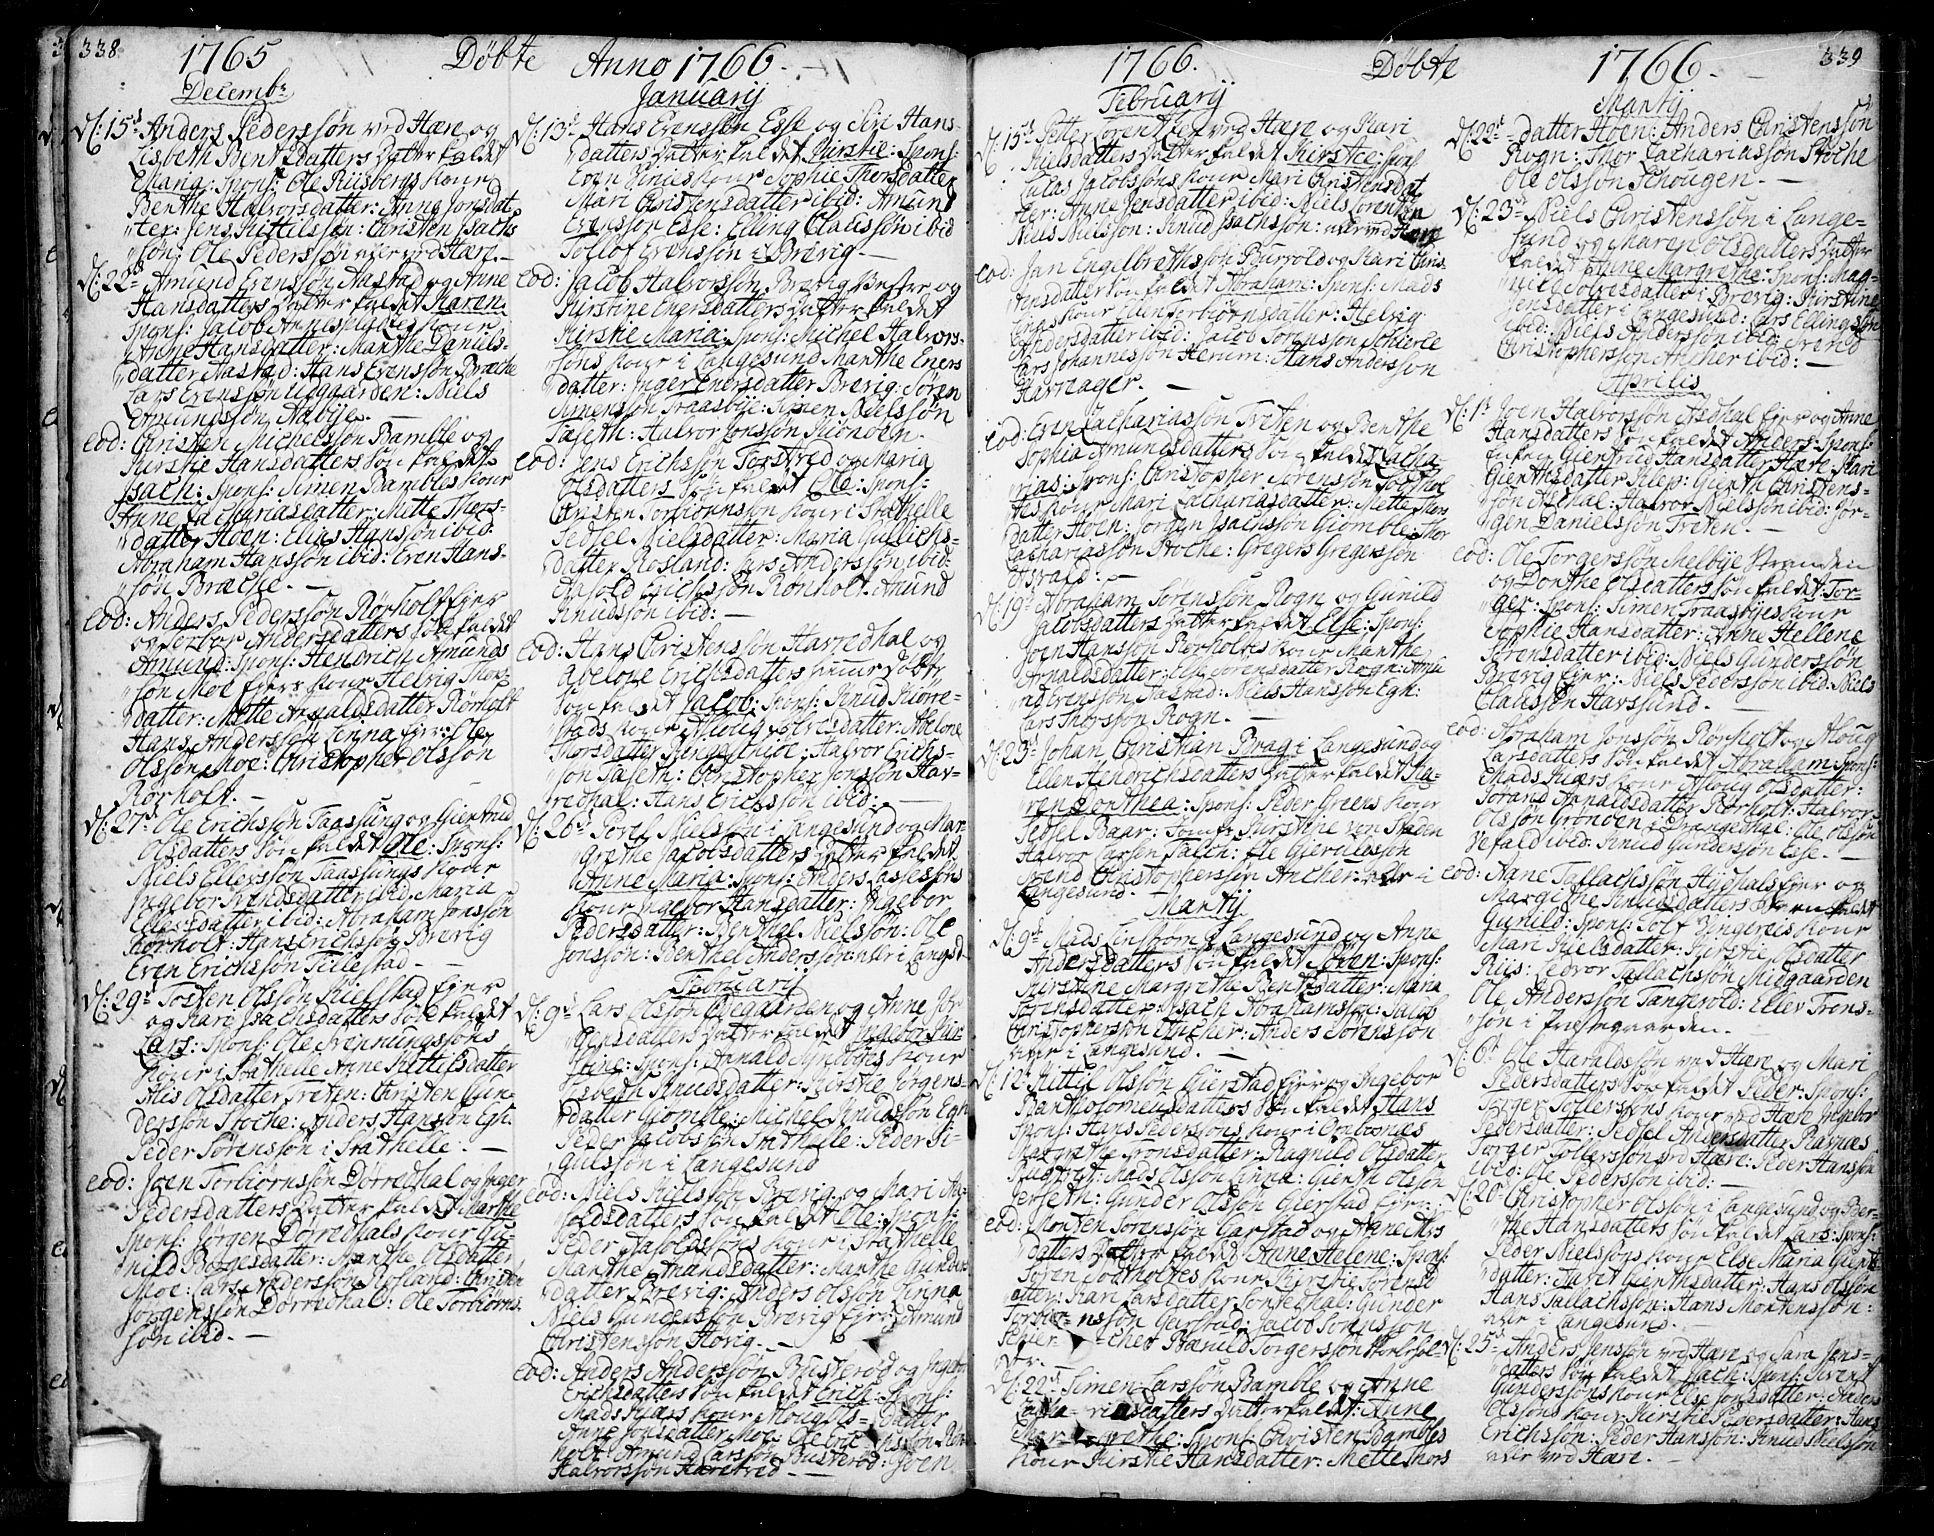 SAKO, Bamble kirkebøker, F/Fa/L0001: Ministerialbok nr. I 1, 1702-1774, s. 338-339